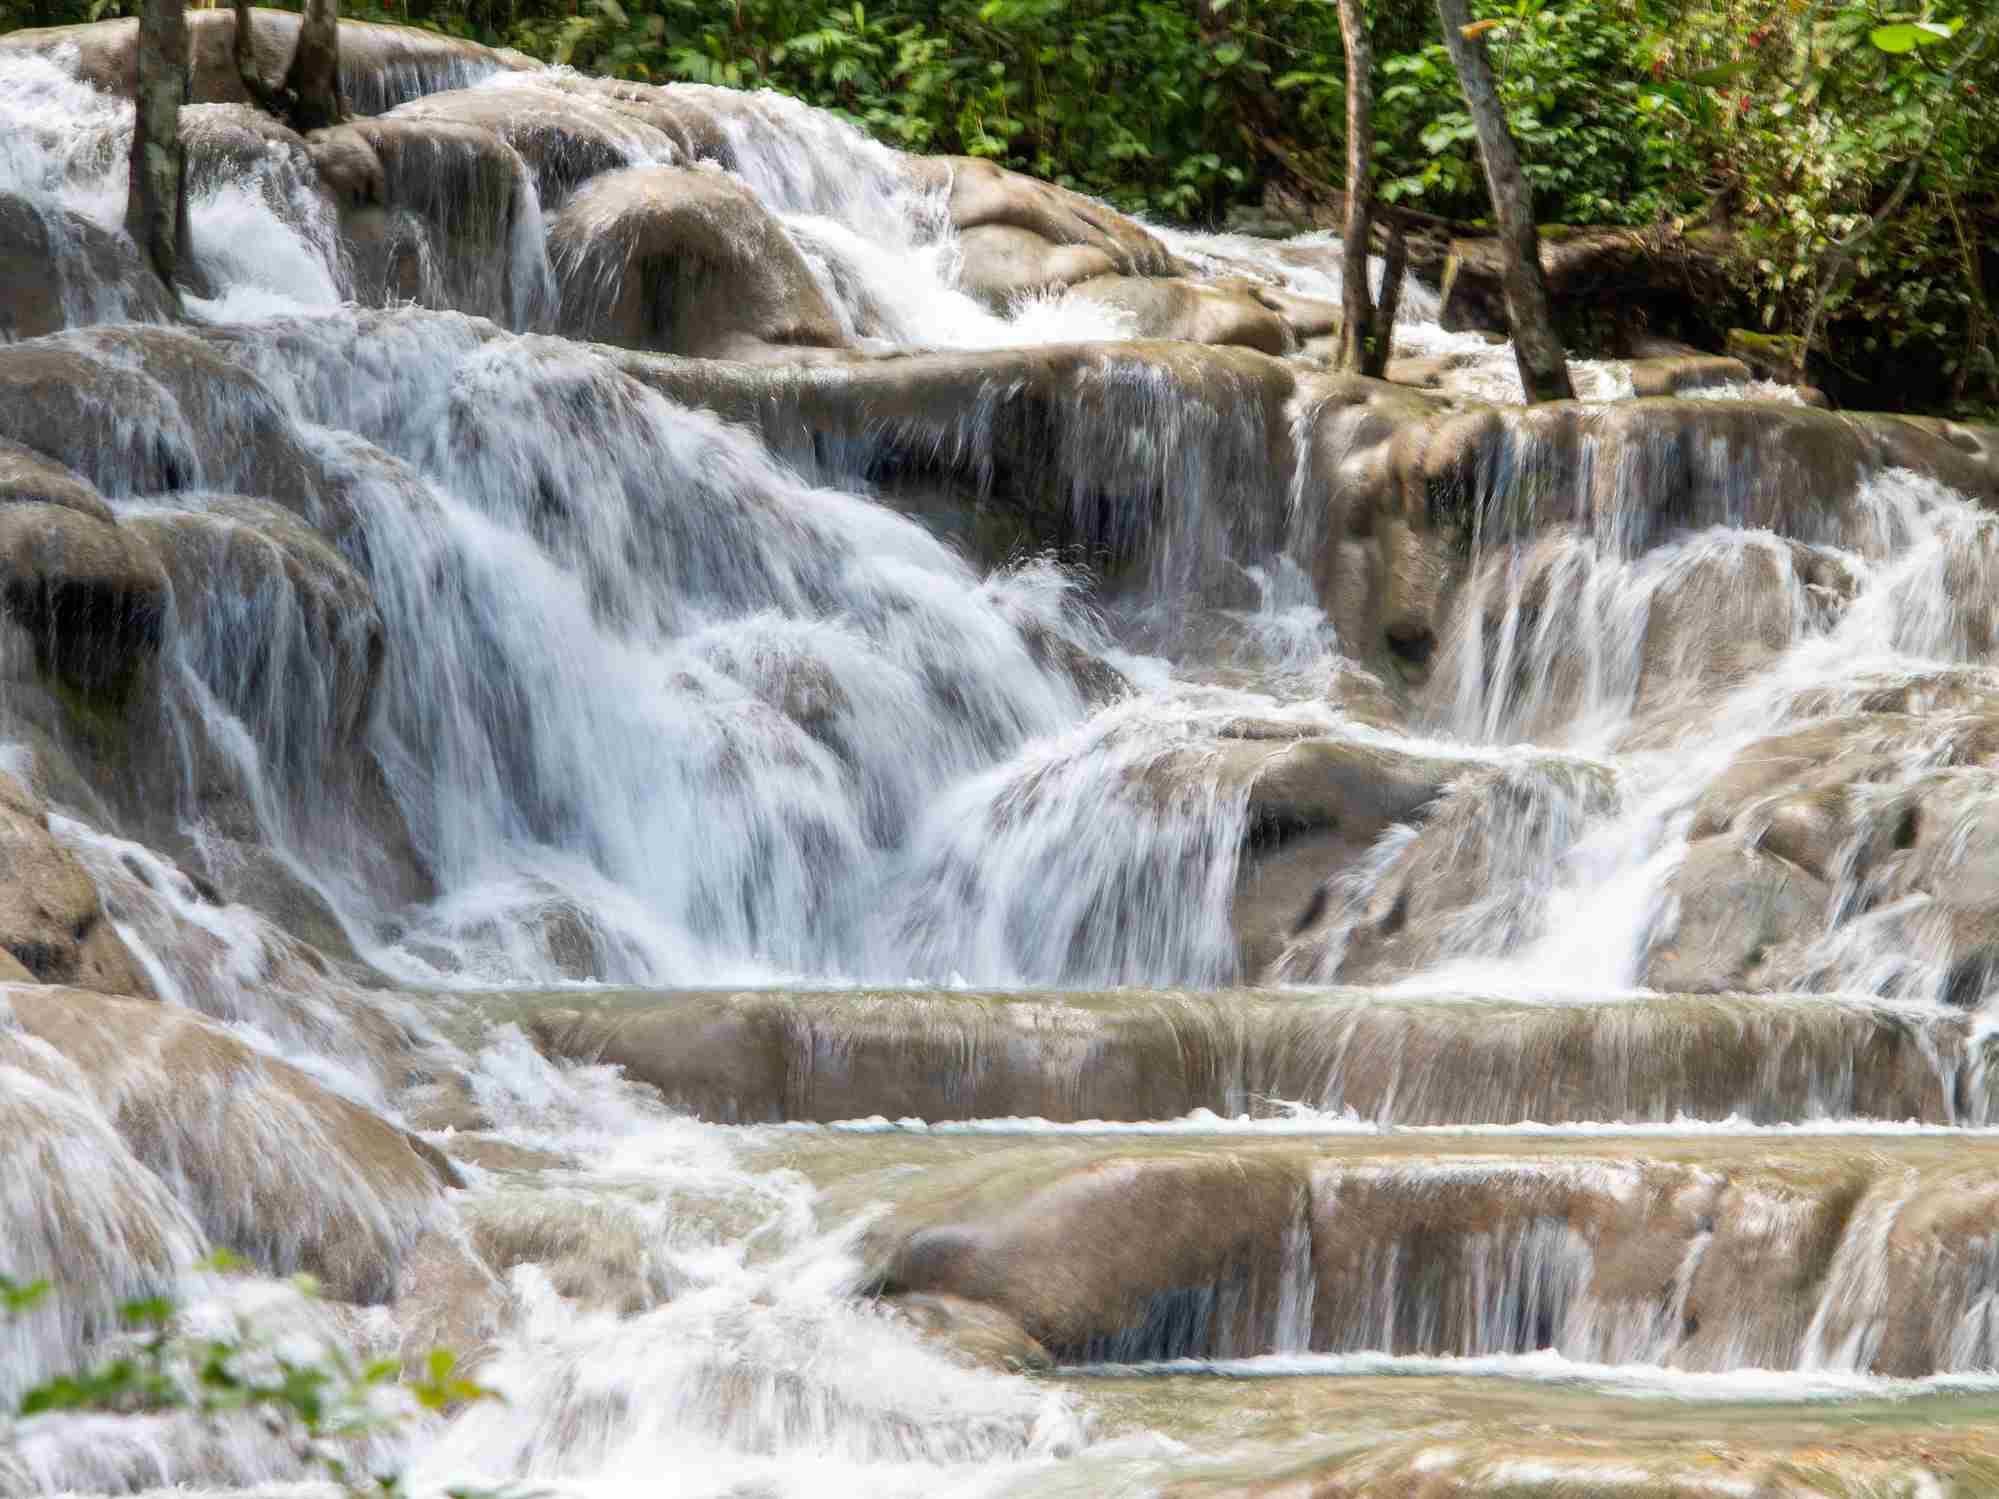 Waterfalls at Dunn's River in Ocho Rios, Jamaica